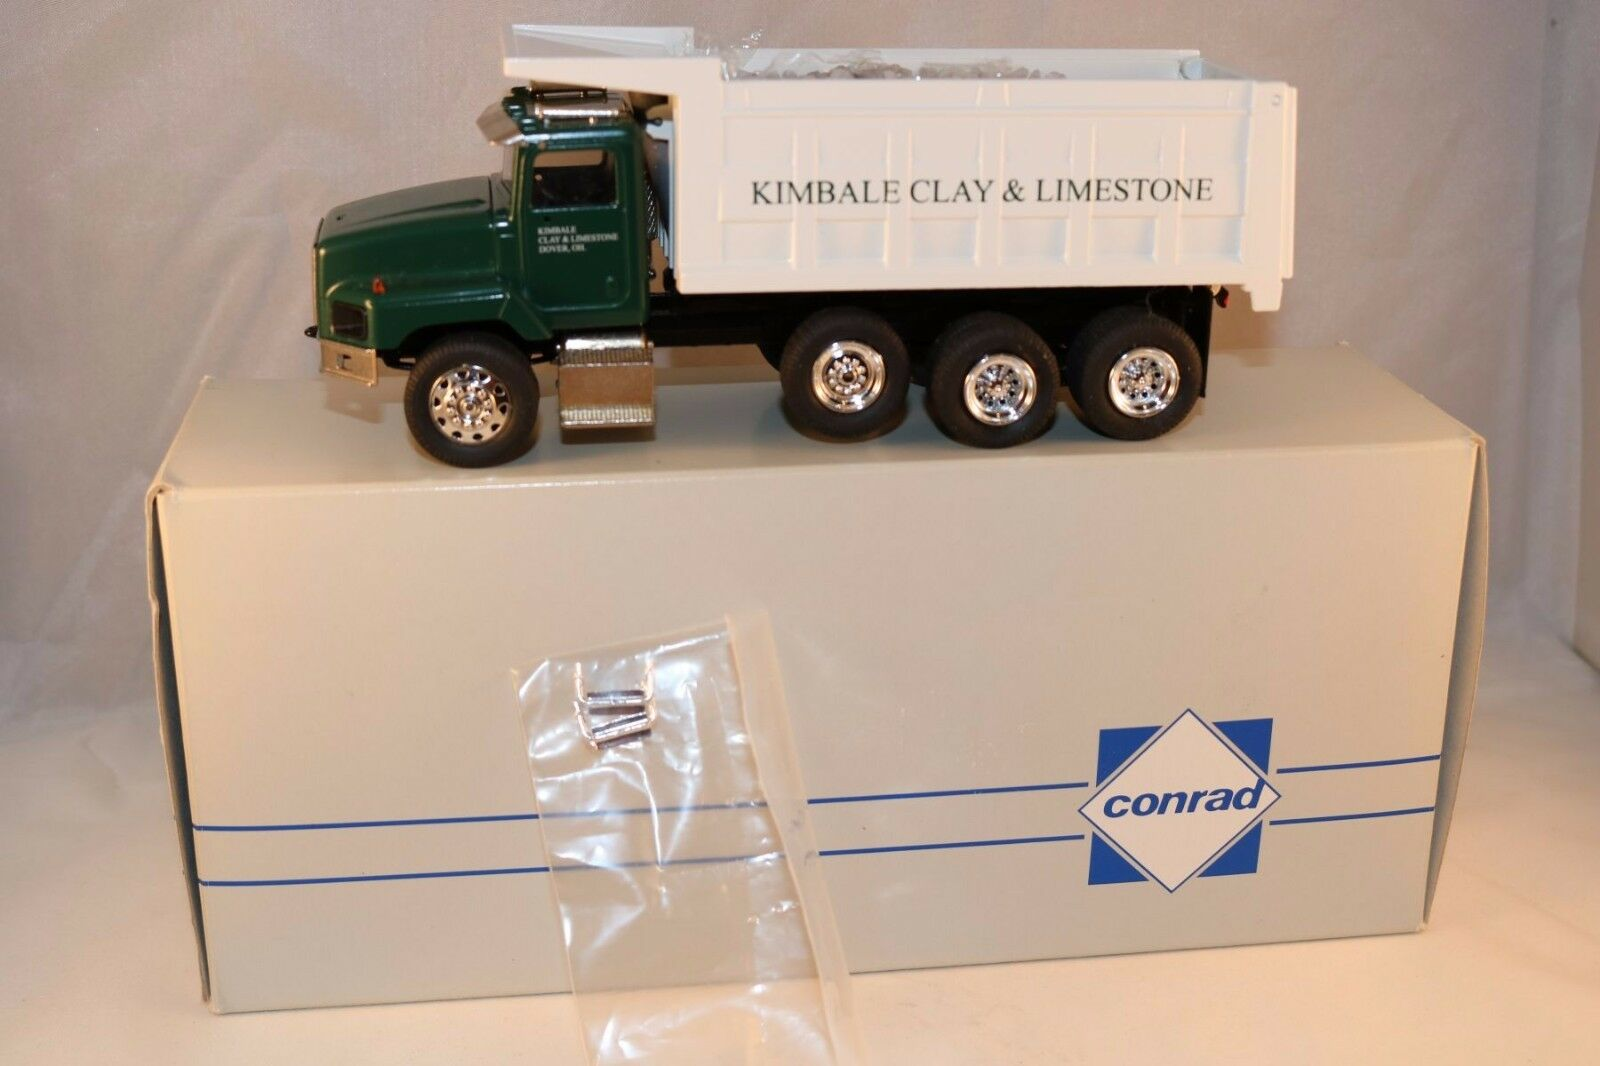 Conrad Conrad Conrad 64105 International P 5000 4-ACHS Kipper  KIMBALE  1 50 OVP mint in box 3aeee0